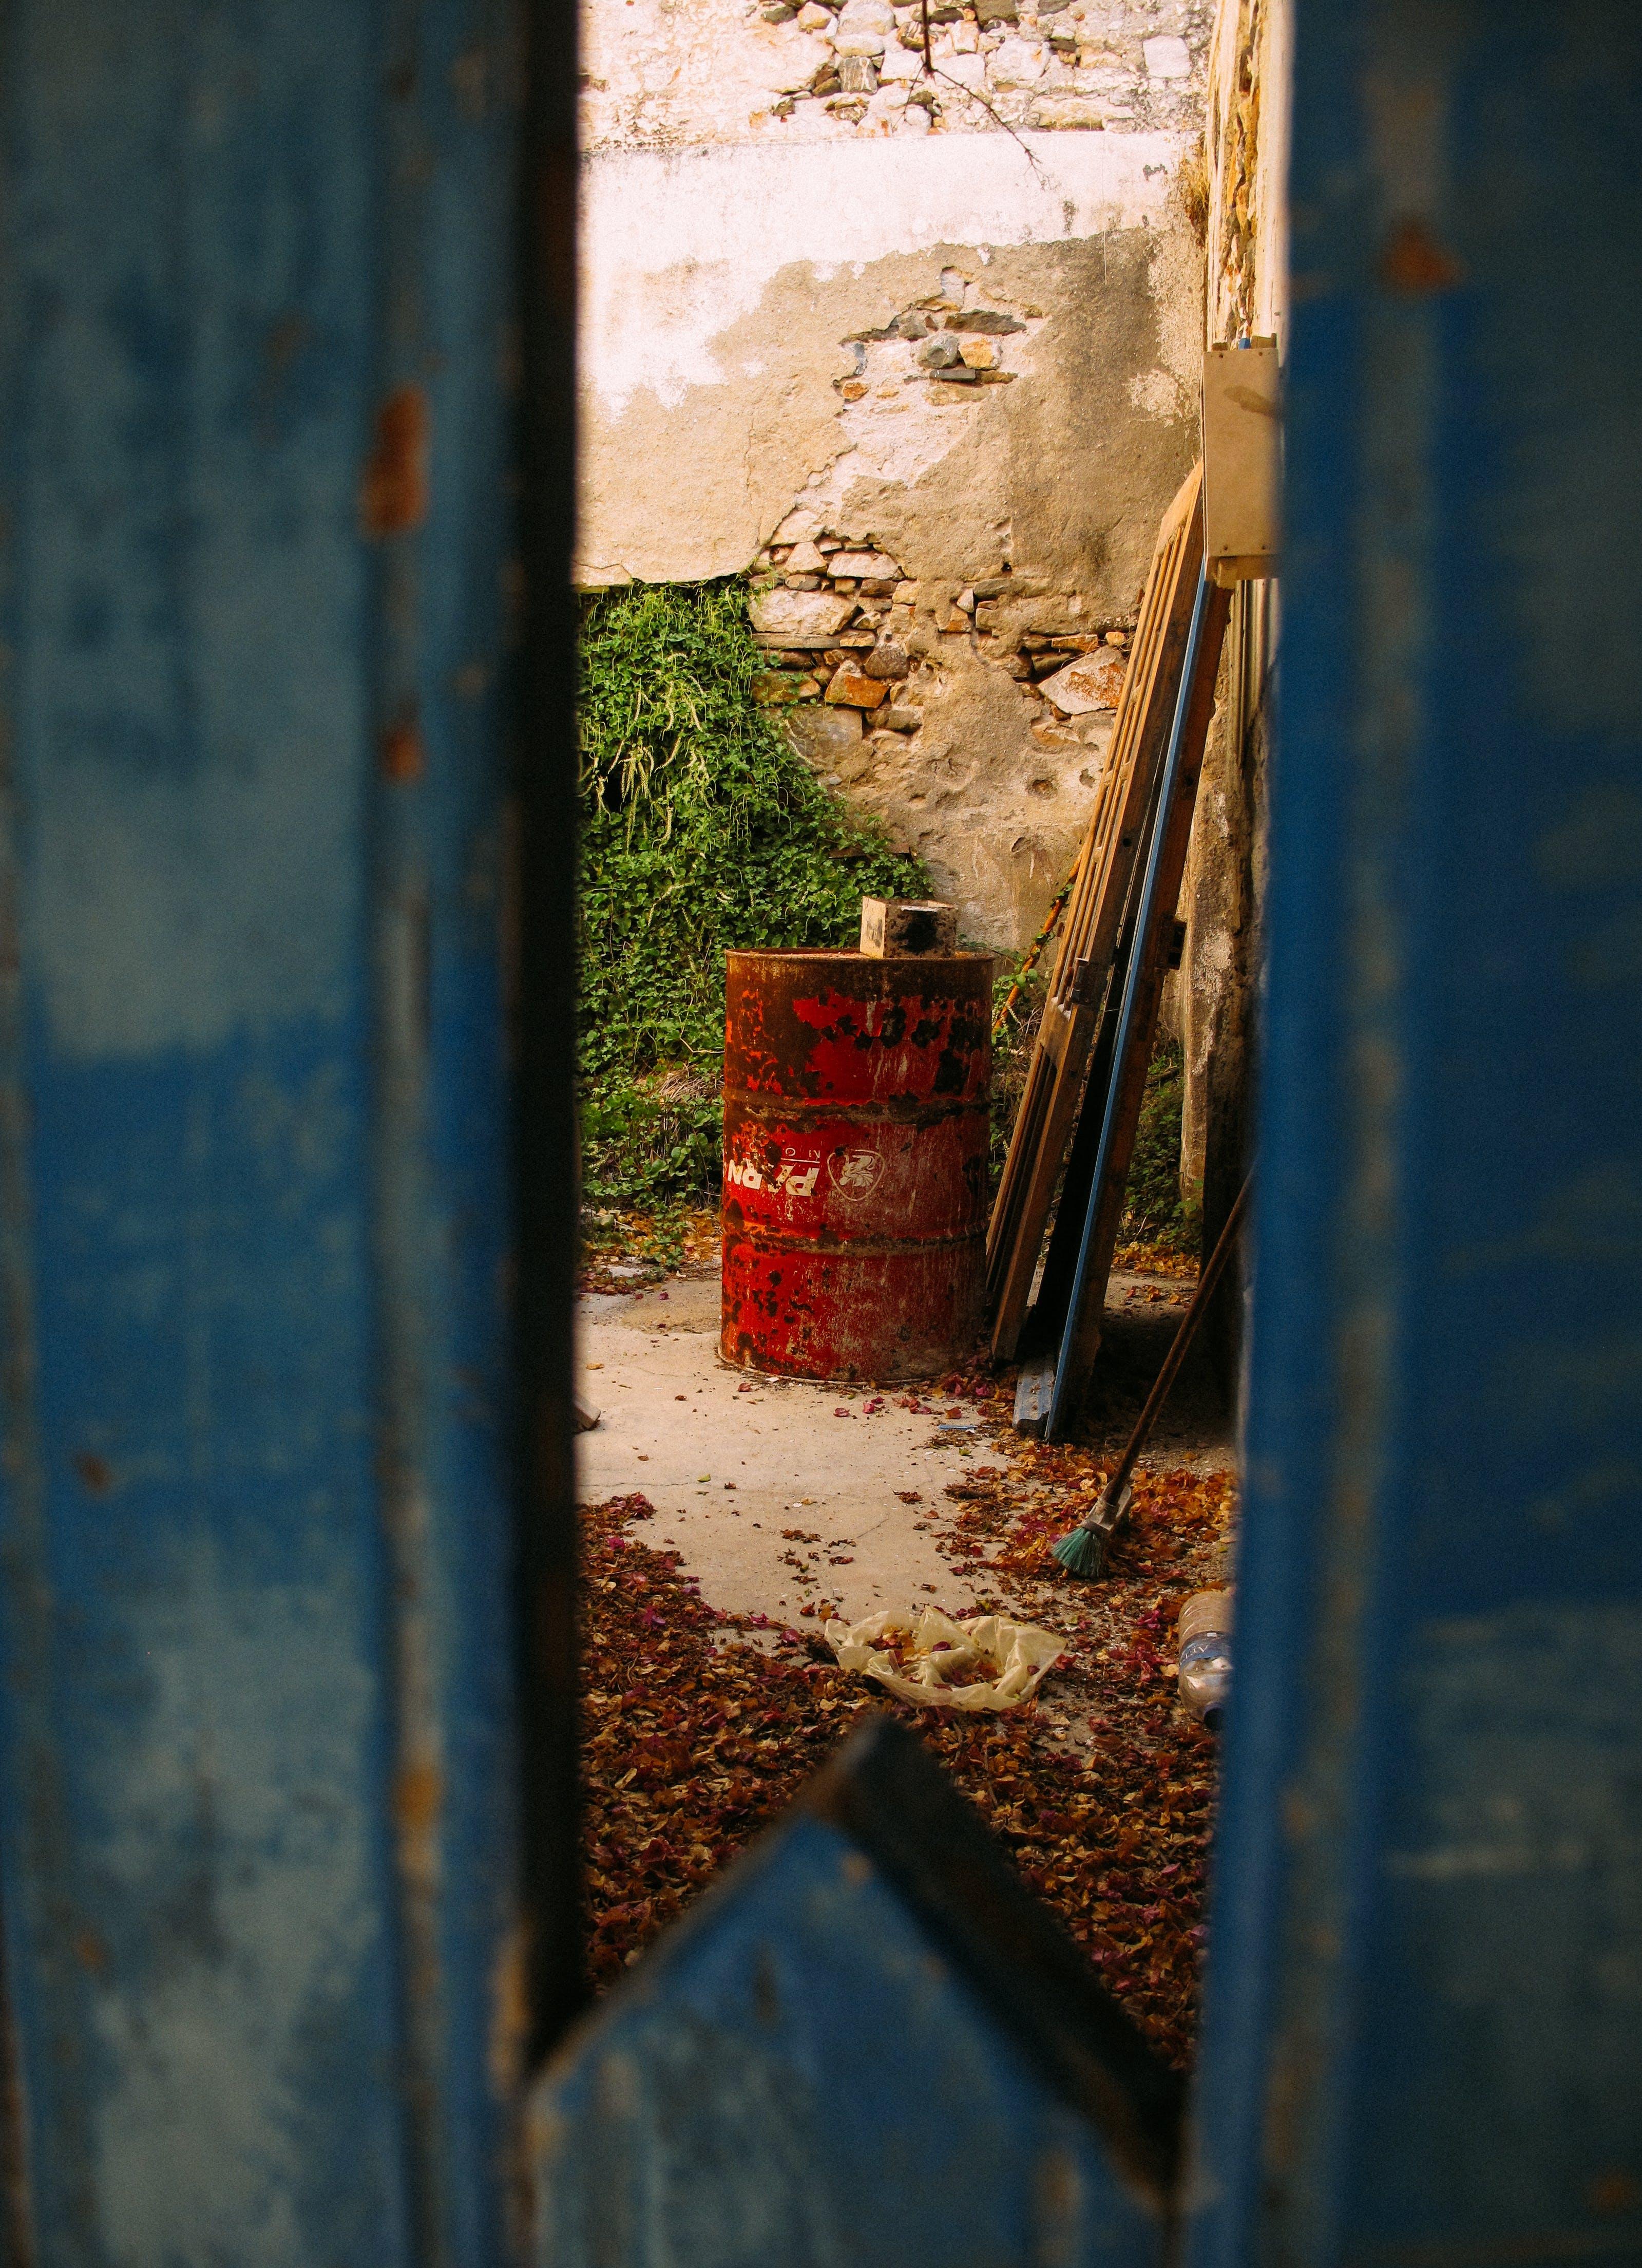 Red Metal Barrel